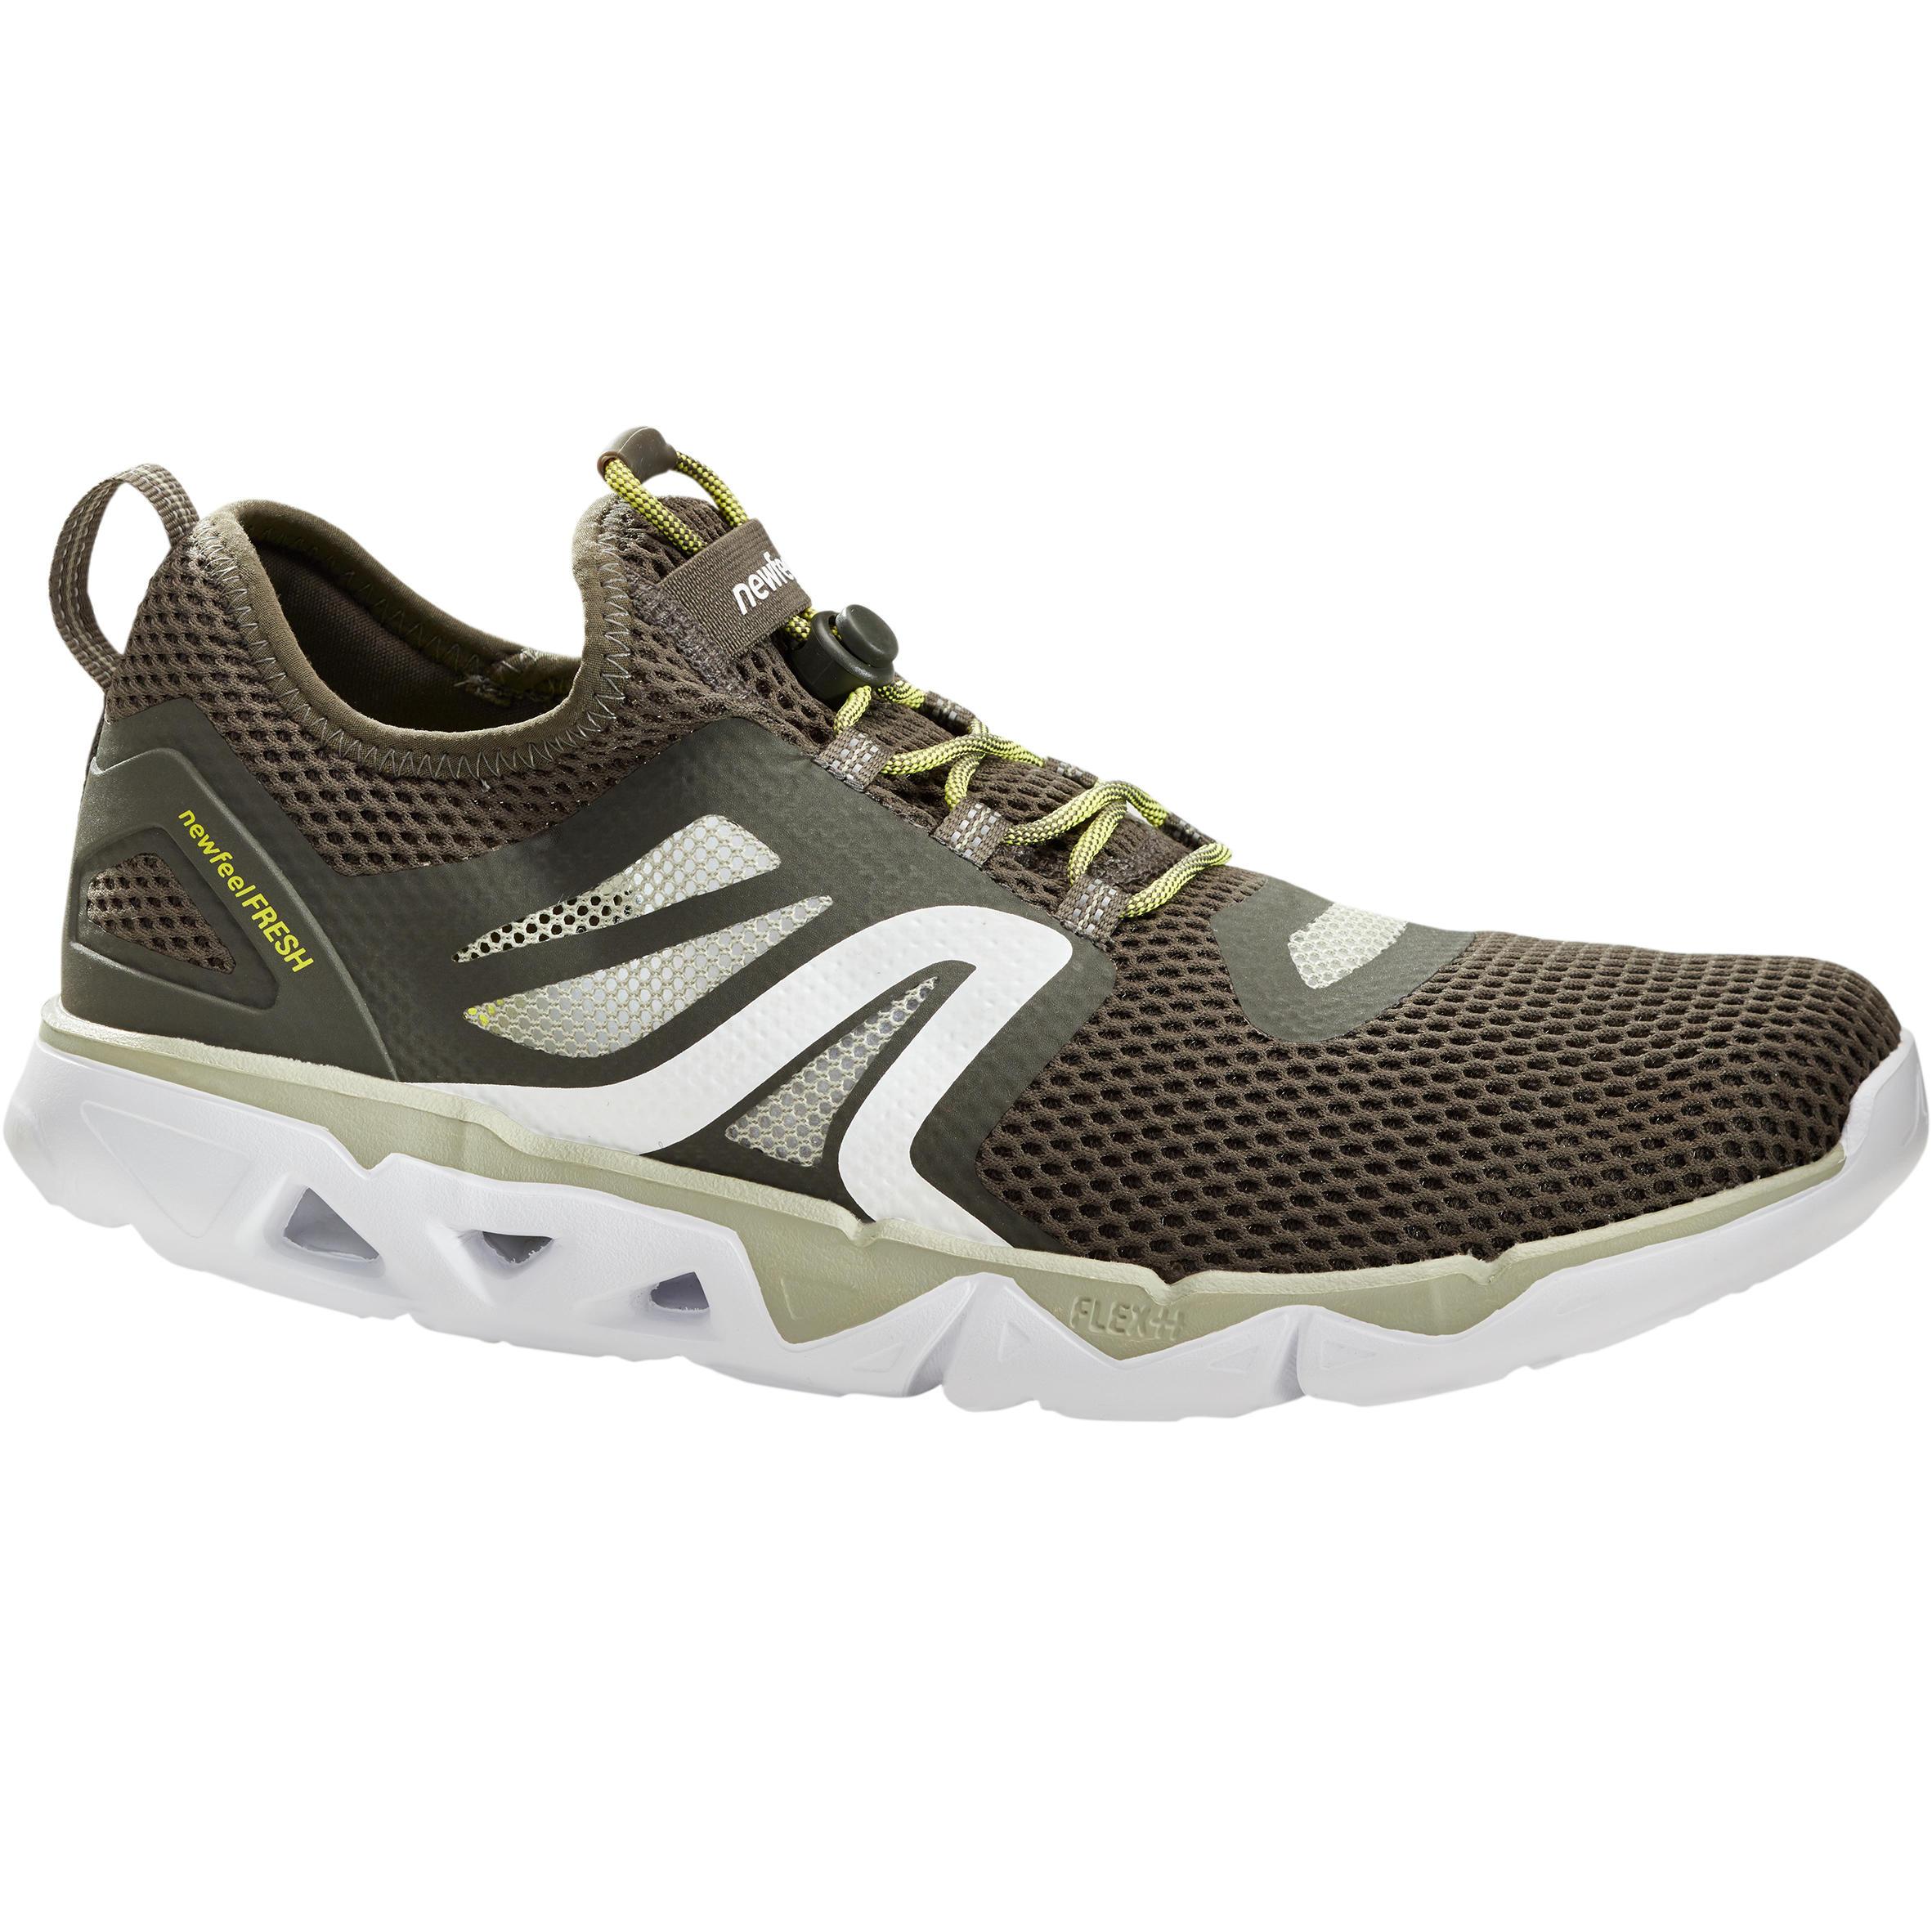 Newfeel Chaussures marche sportive homme PW 500 Fresh vert kaki - Newfeel